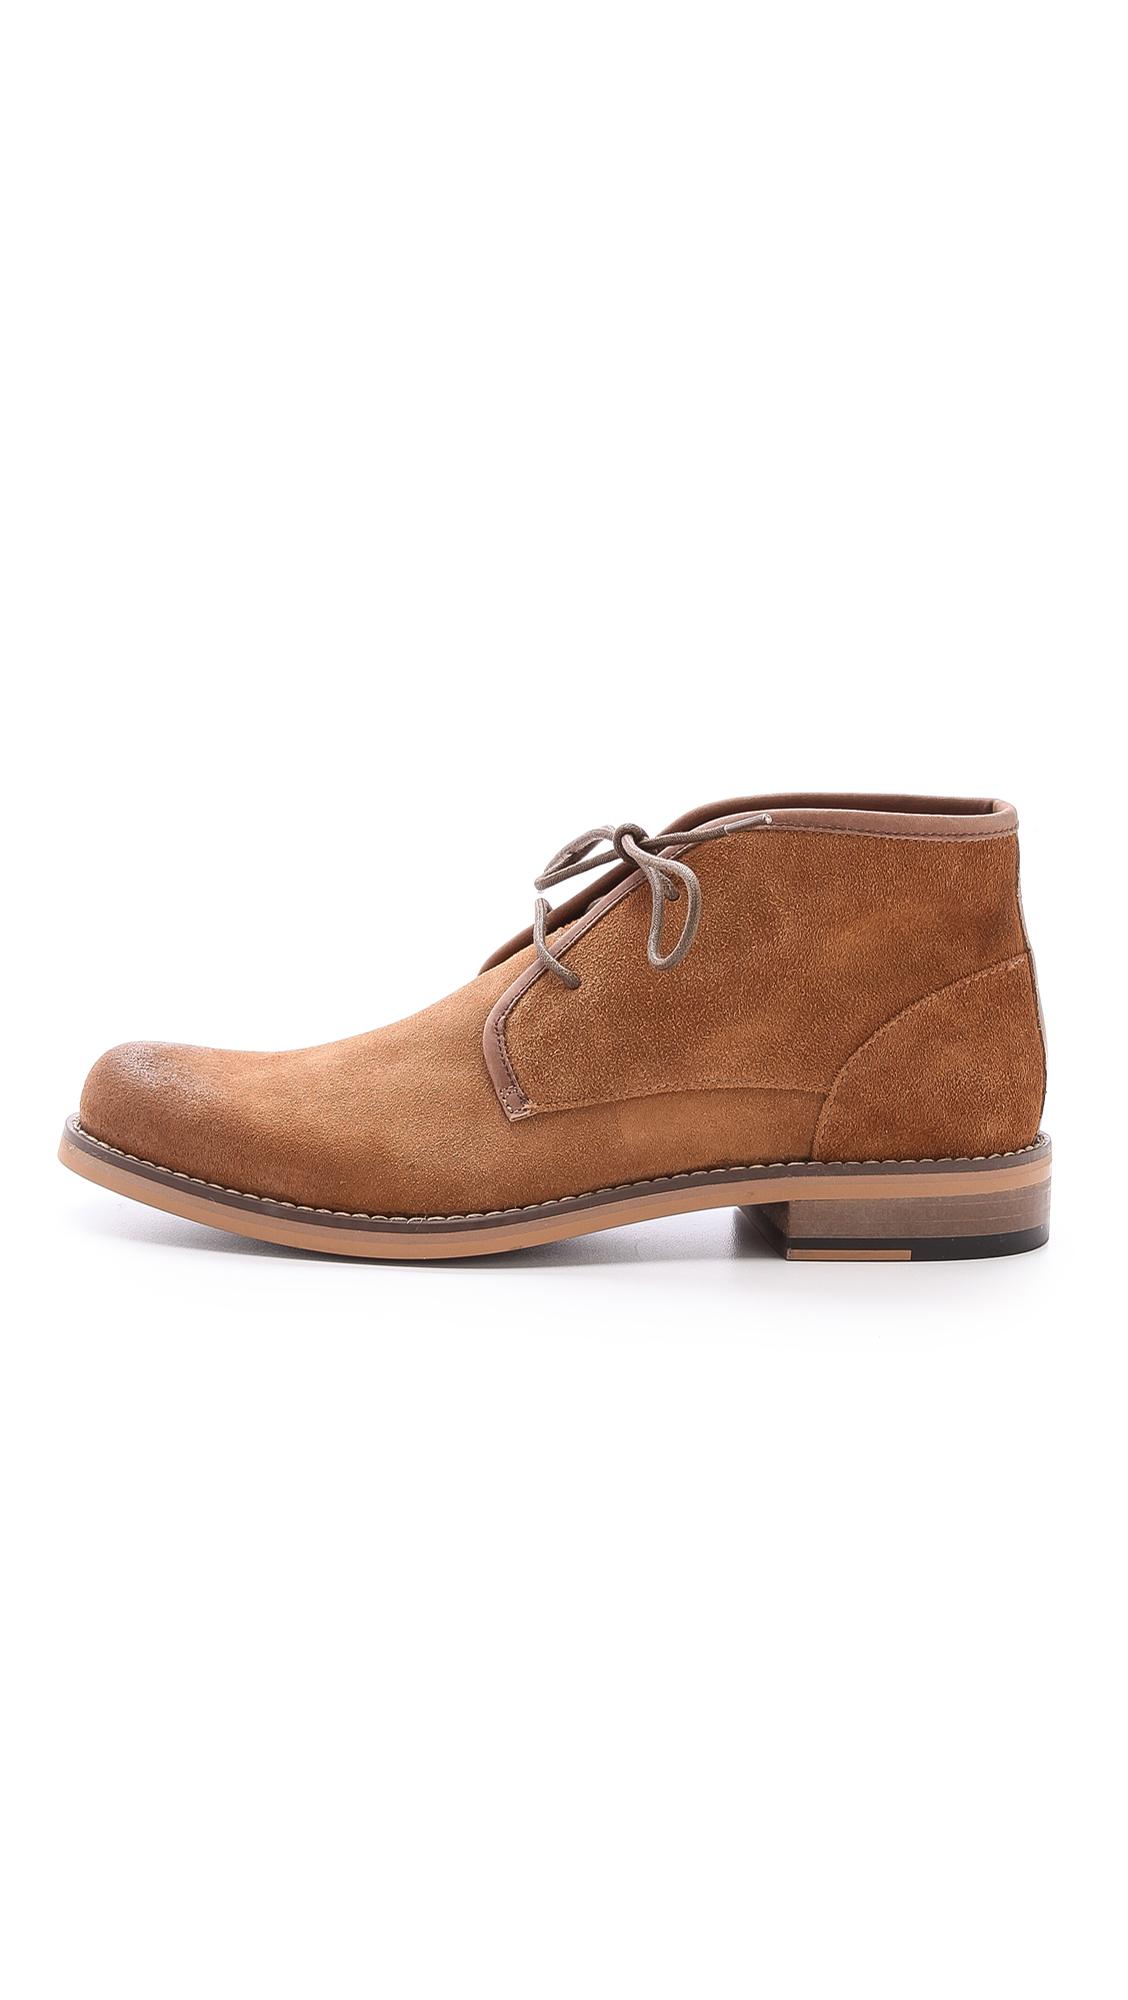 278aa7af512 Wolverine Brown Orville Leather Desert Boots for men